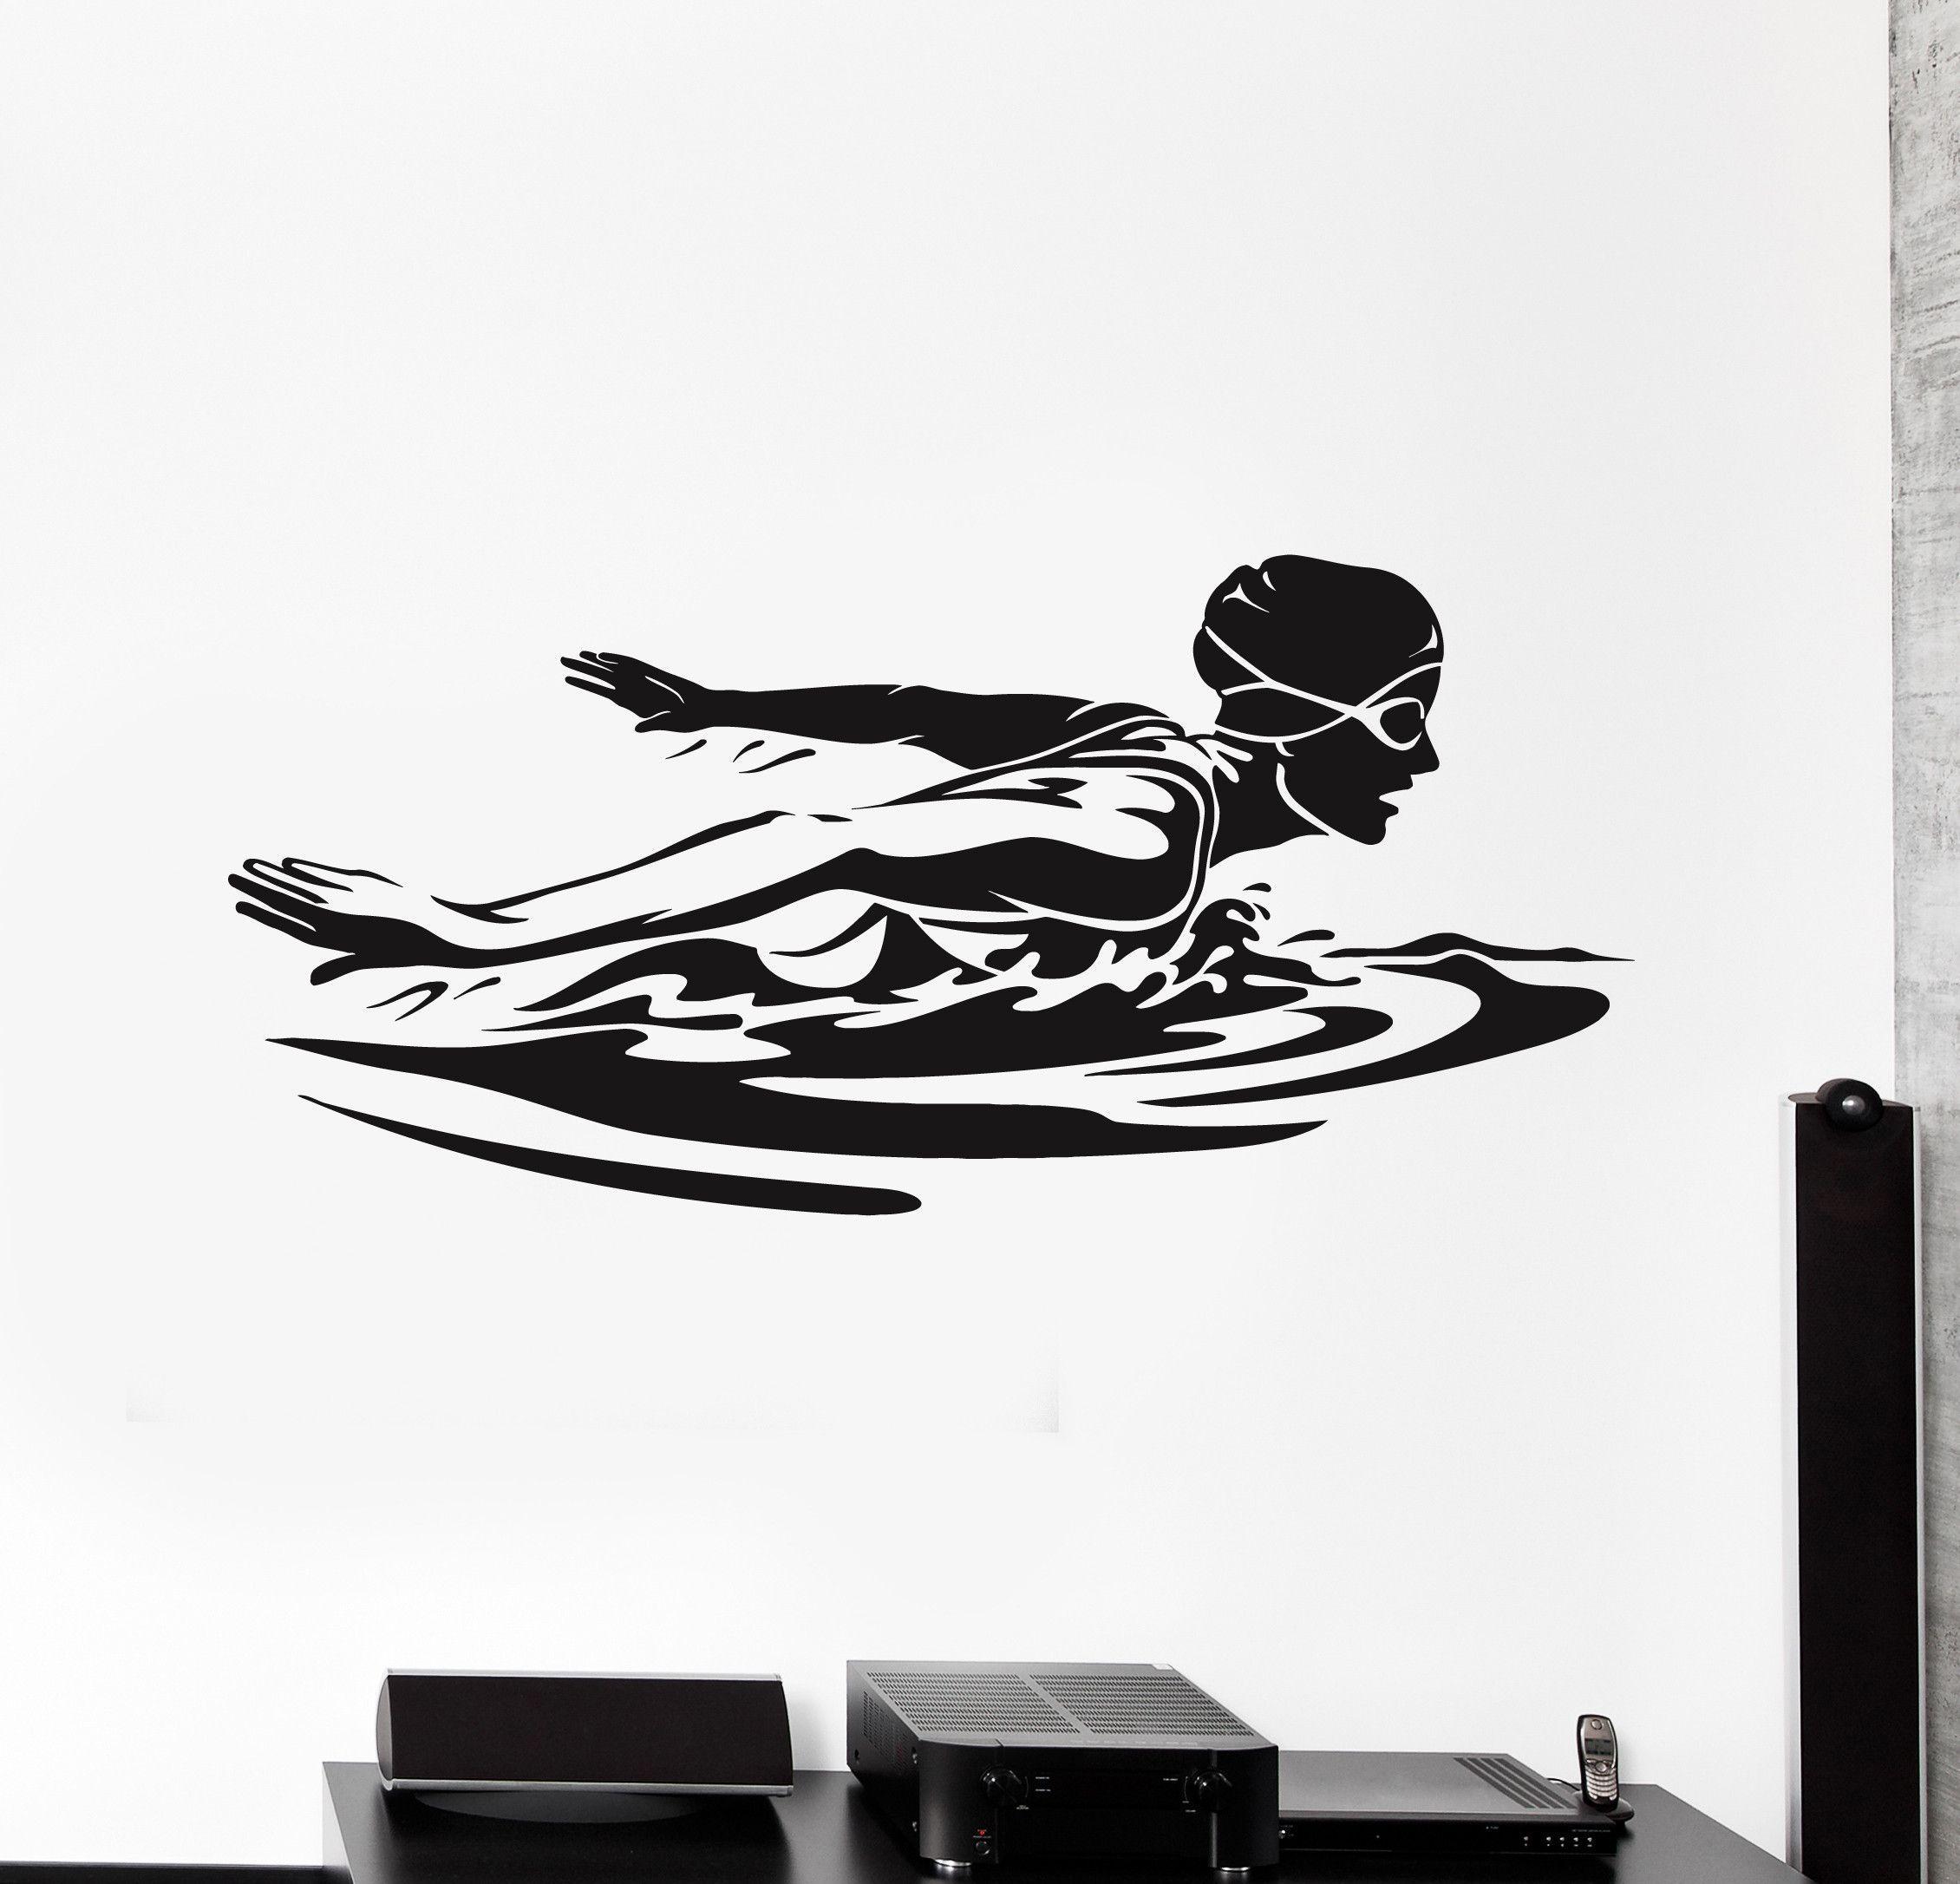 Vinyl Wall Decal Female Swimmer Woman Swimming Pool Swim Stickers